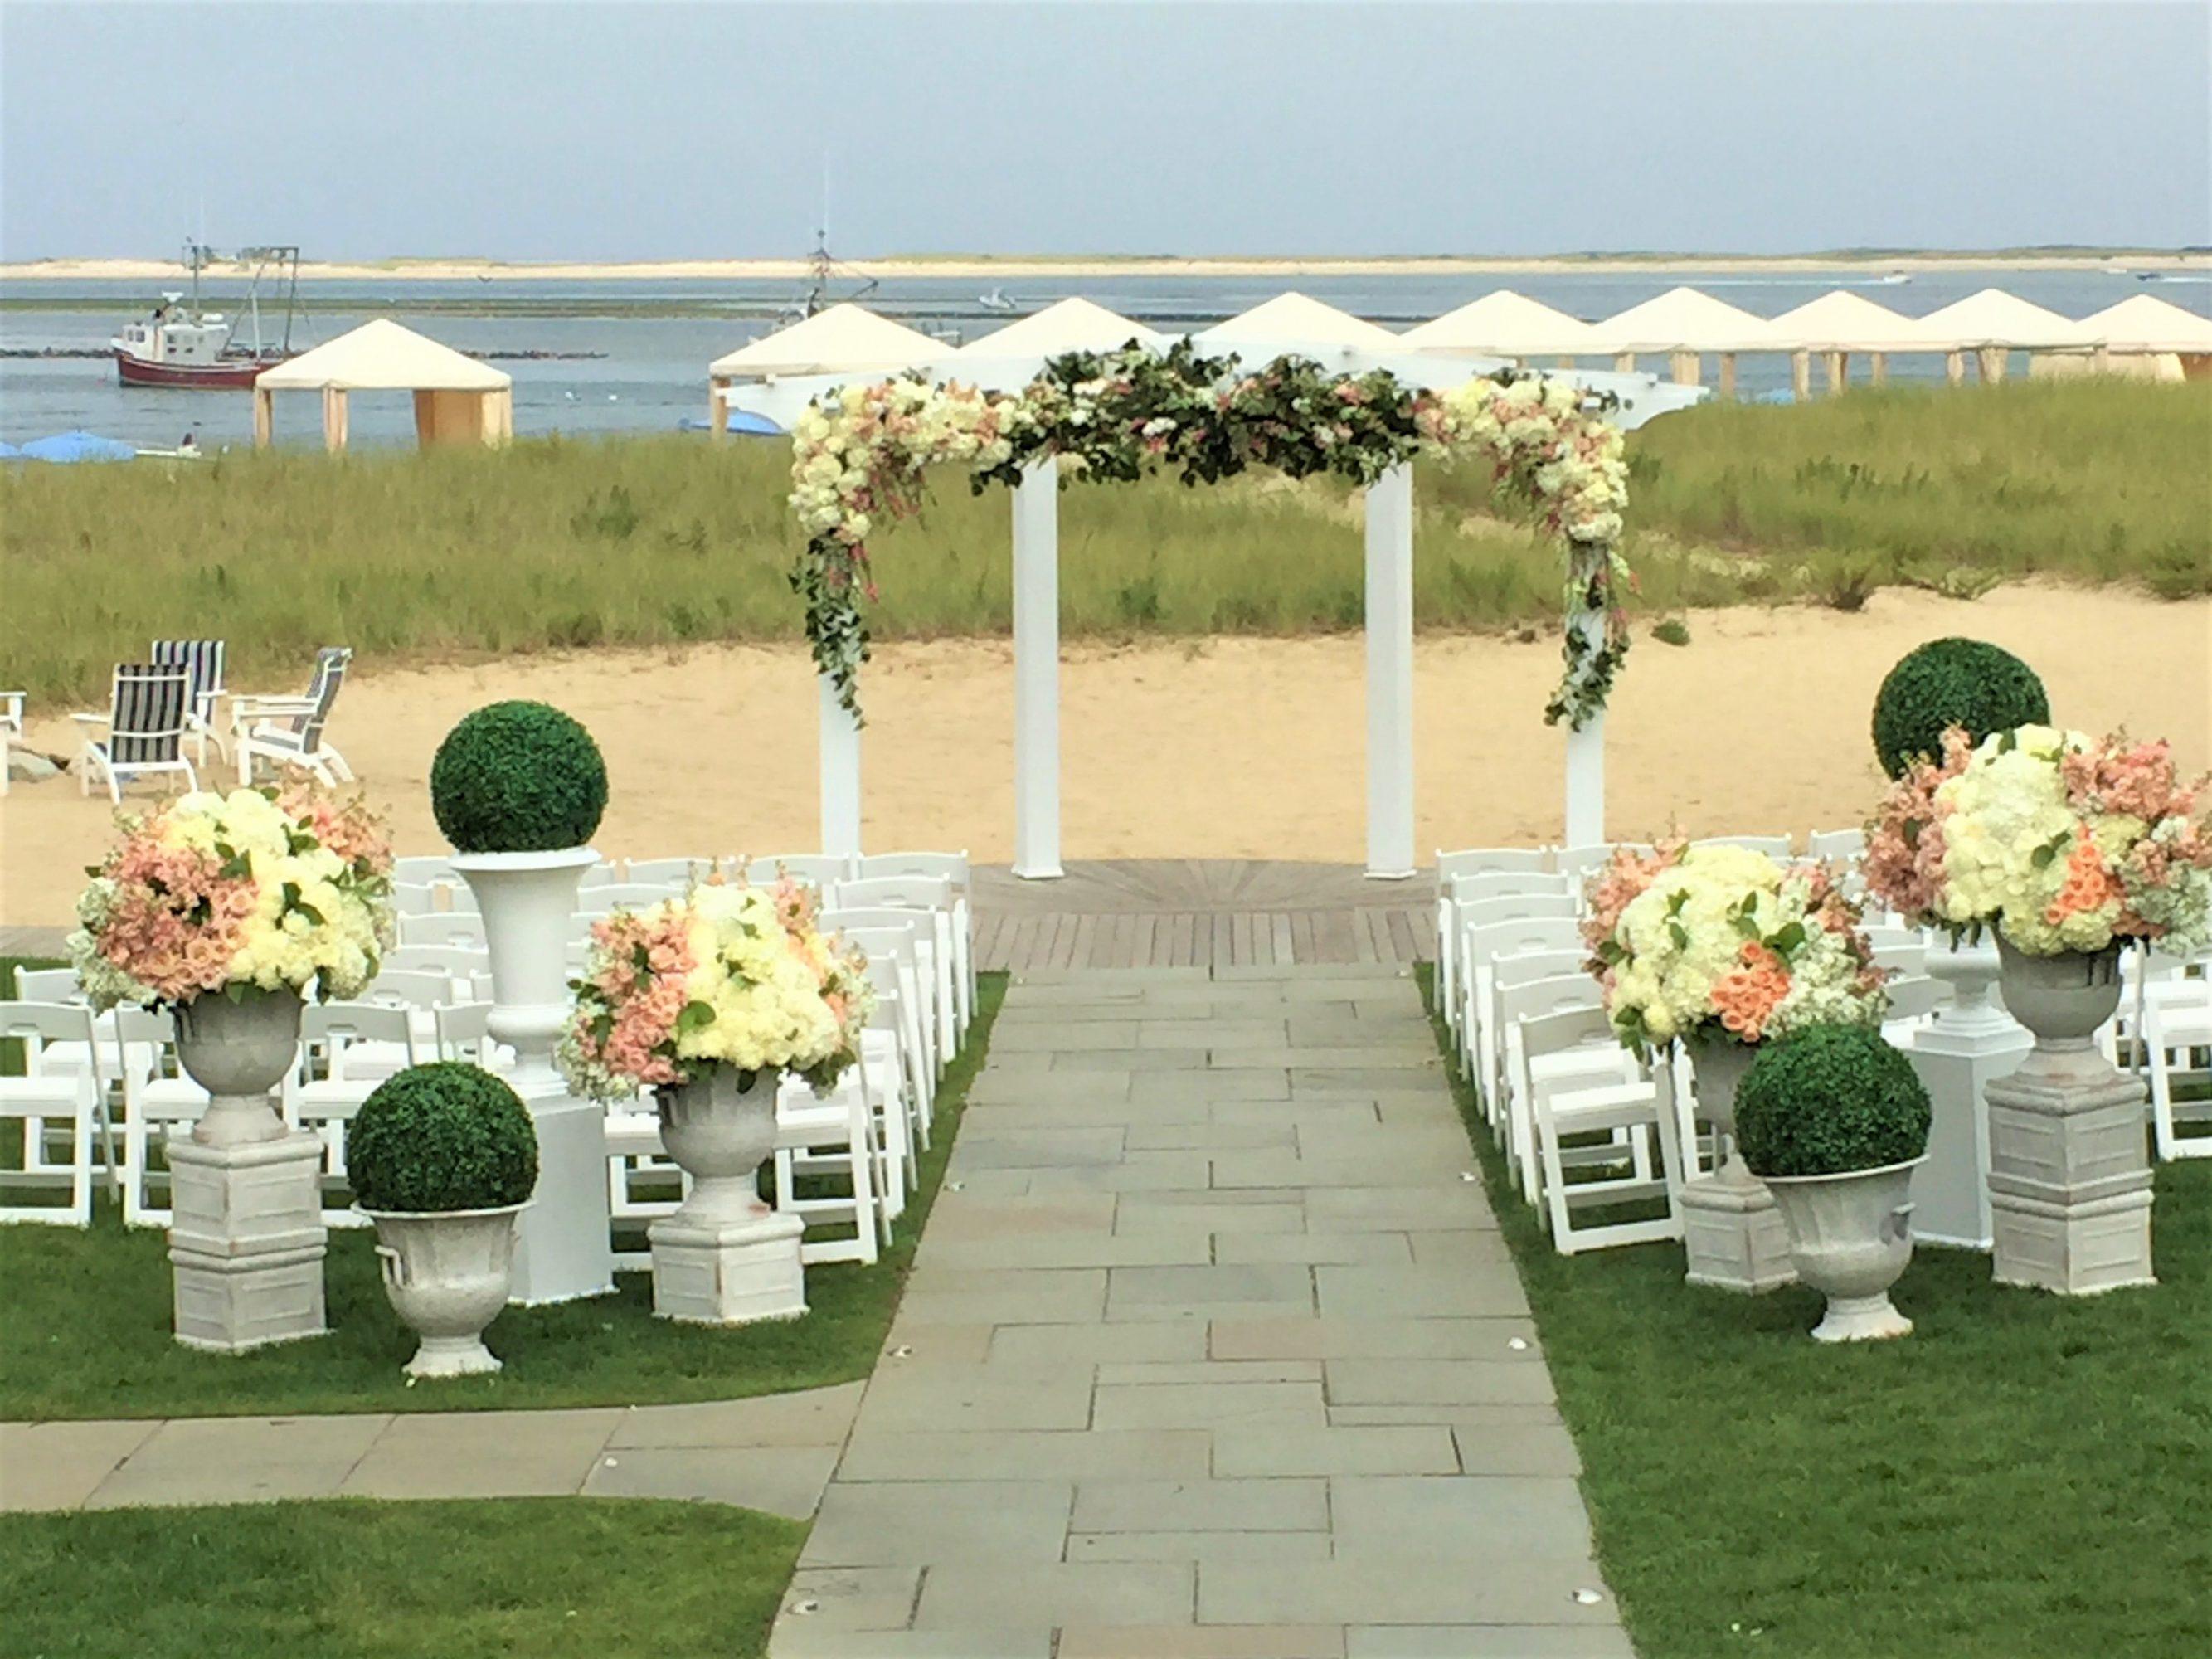 Flou(-e)r_Specialty_Floral_Events_Beach_Wedding